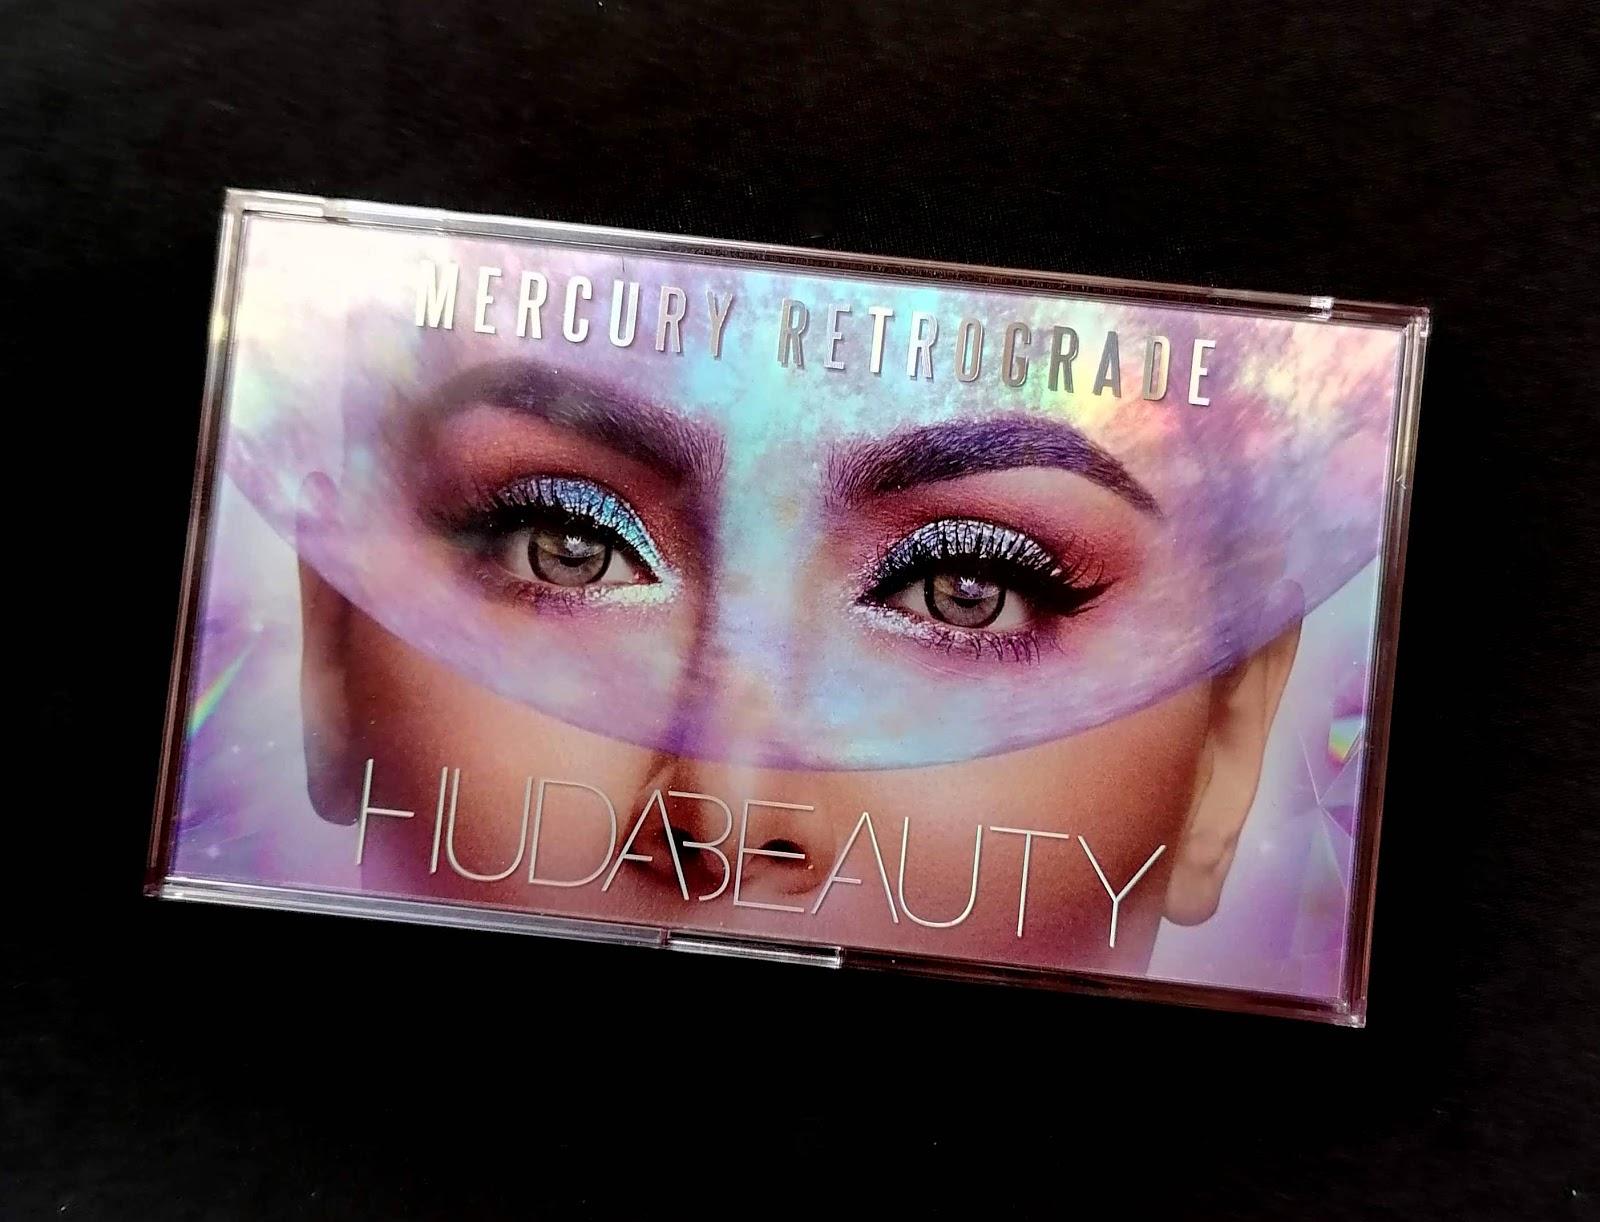 Mercury Retrograde Huda Beauty review